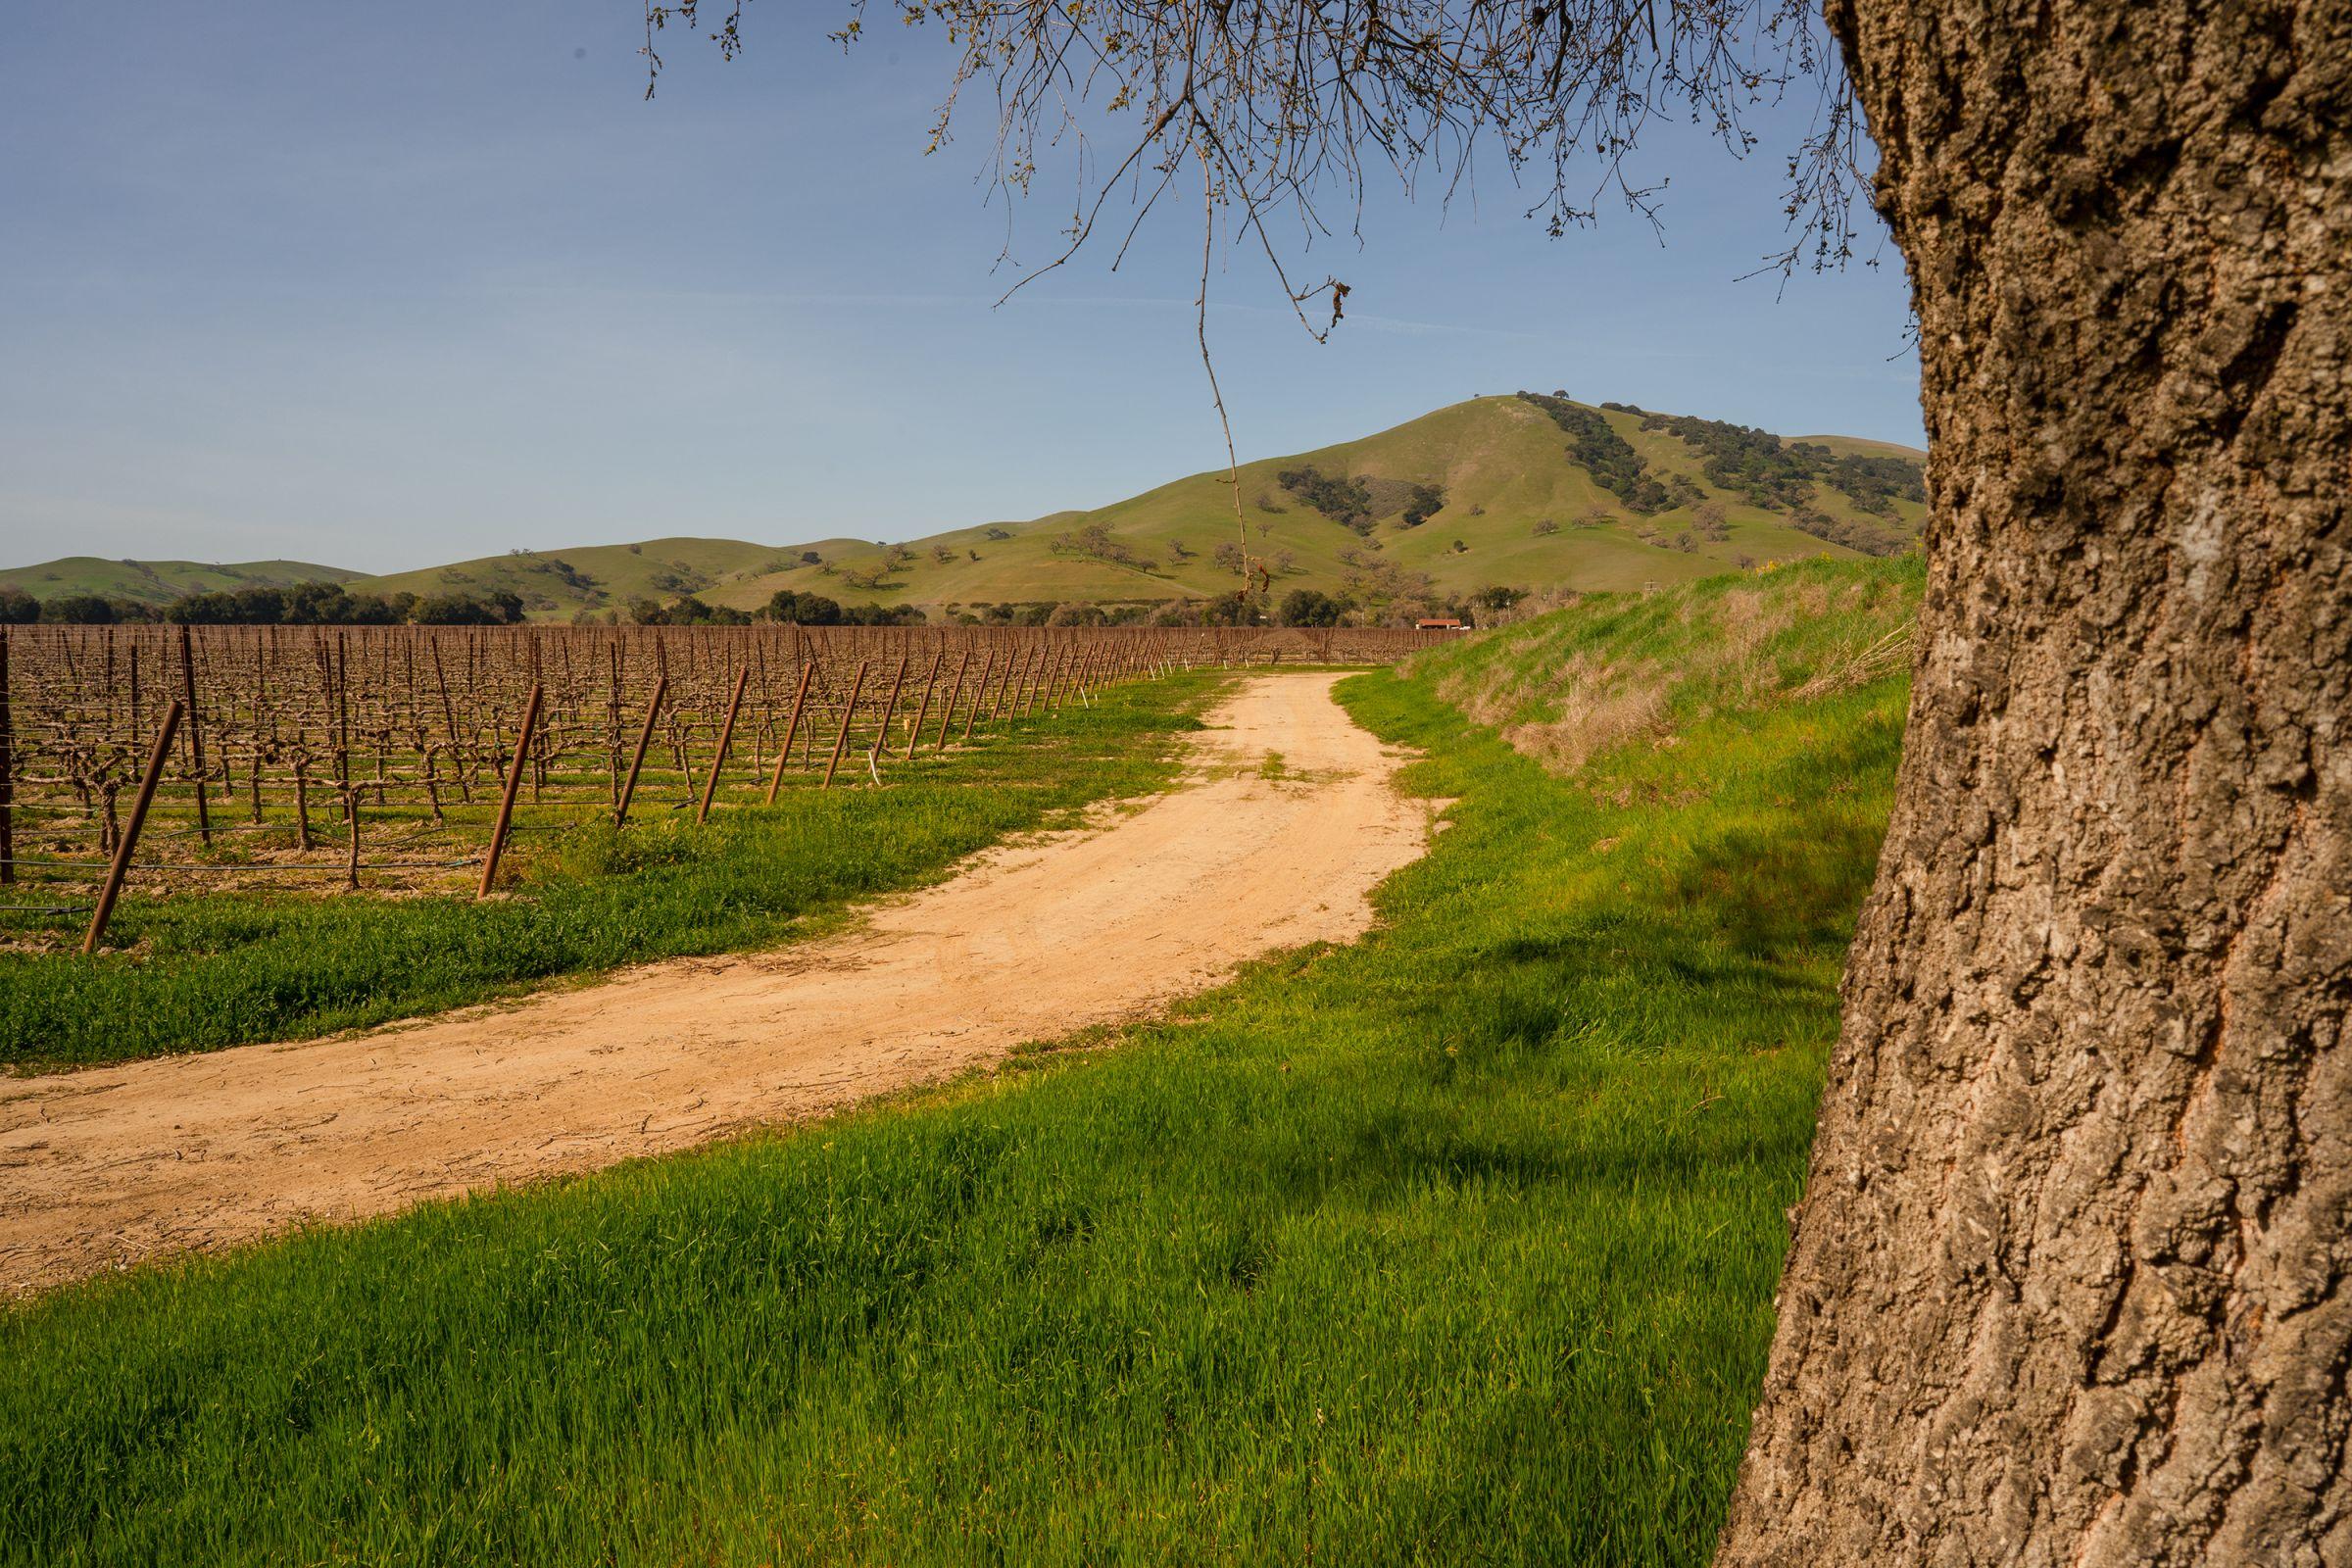 santa-clara-county-california-497-acres-listing-number-15435-2-2021-03-30-213027.jpg